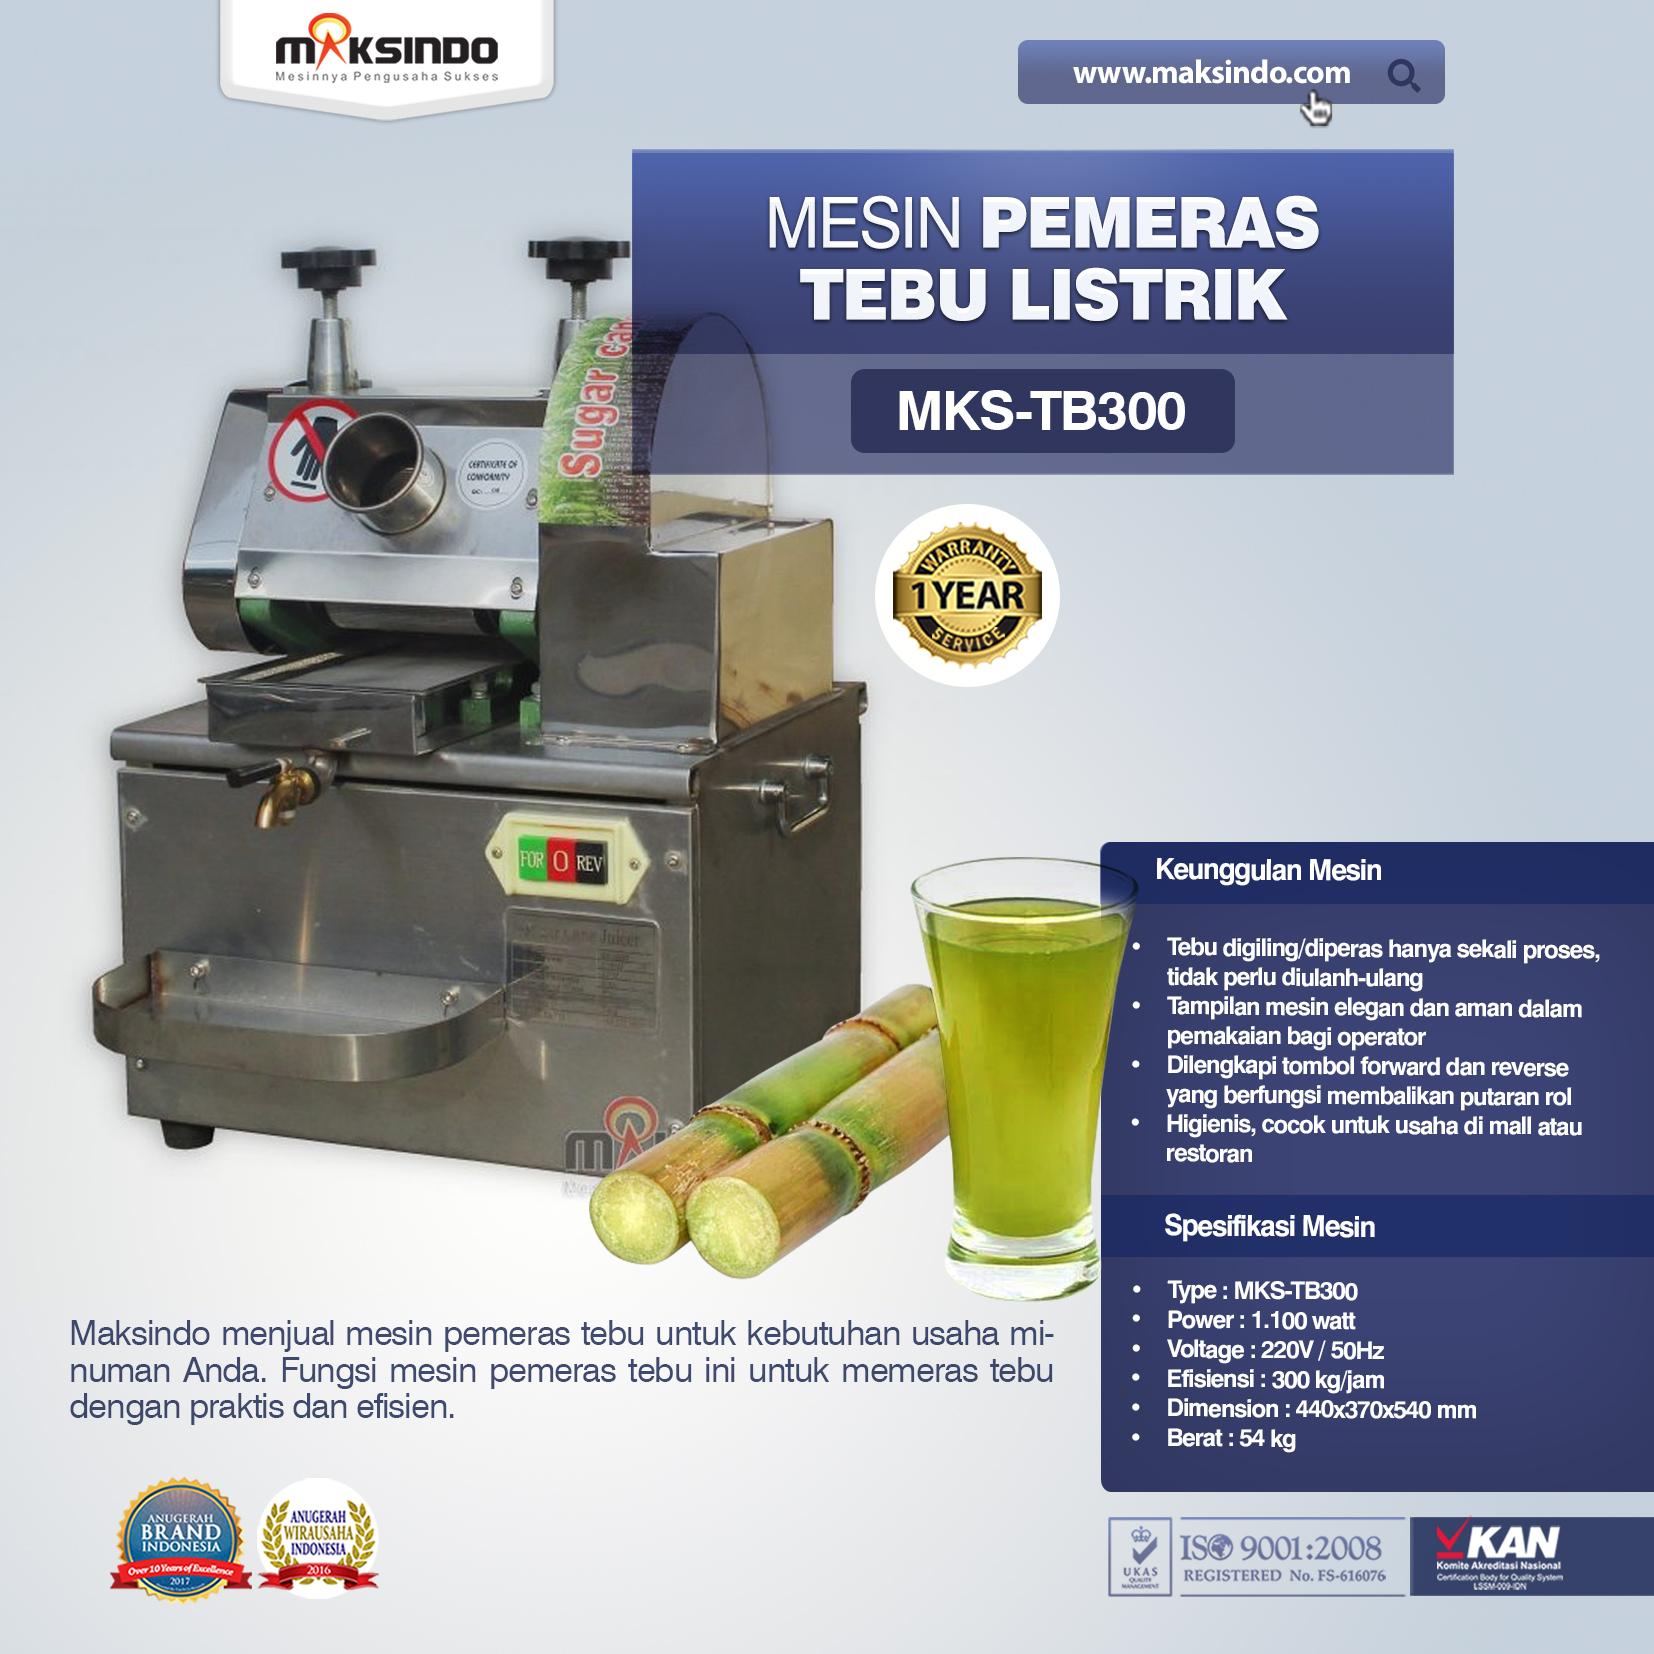 Mesin Pemeras Tebu Listrik MKS-TB300